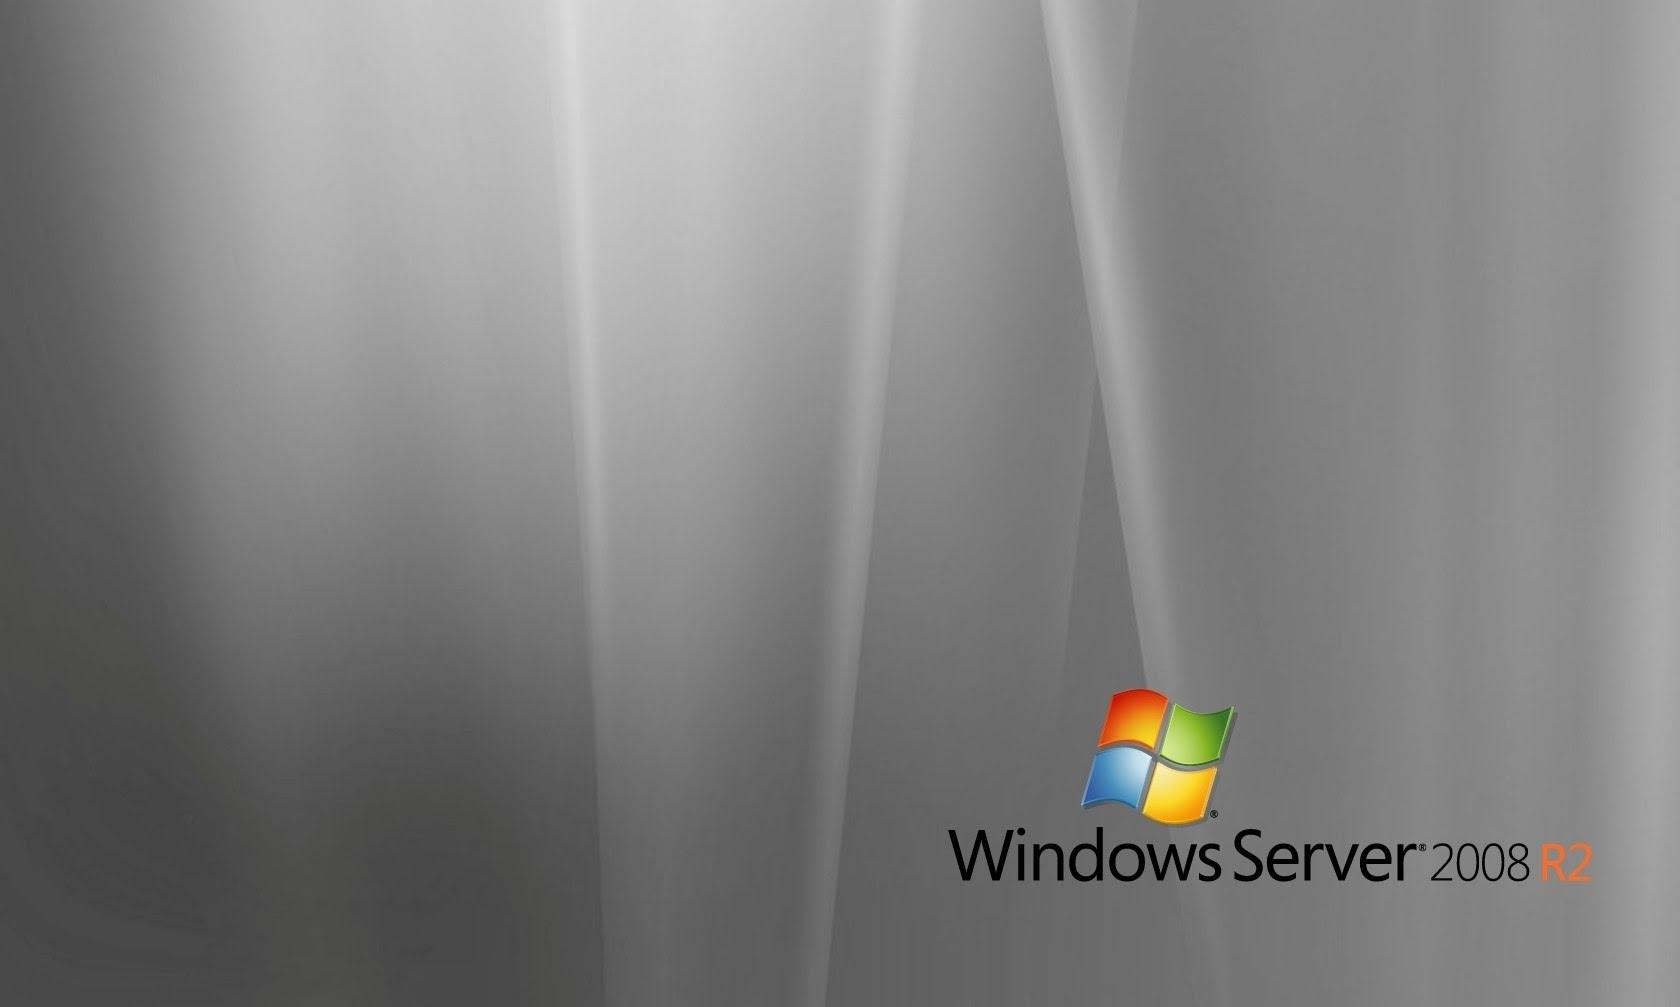 2 - active directory - windows server 2008 r2 - youtube